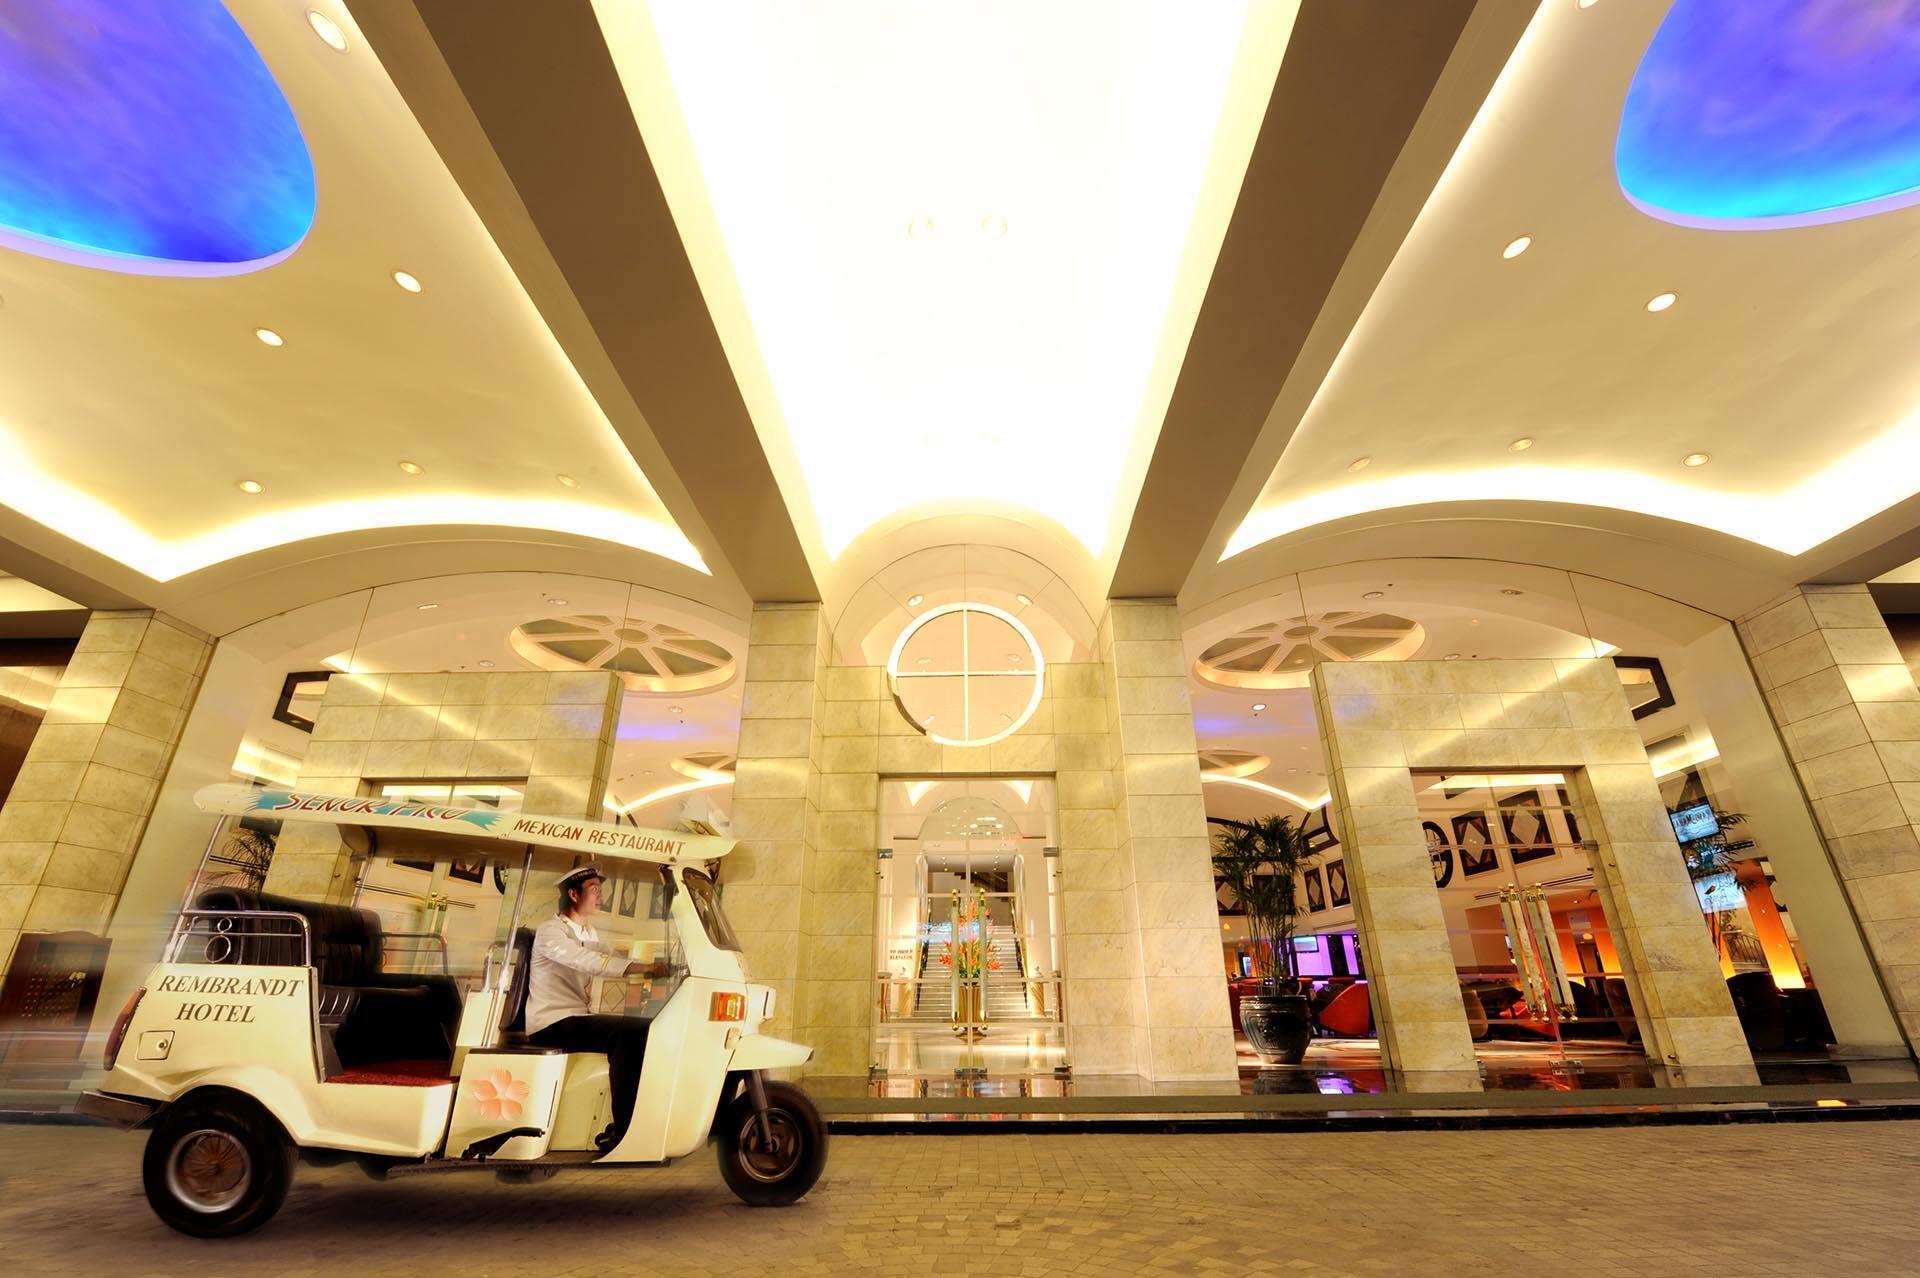 Entrance Tuk Tuk Rembrandt Hotel Bangkok